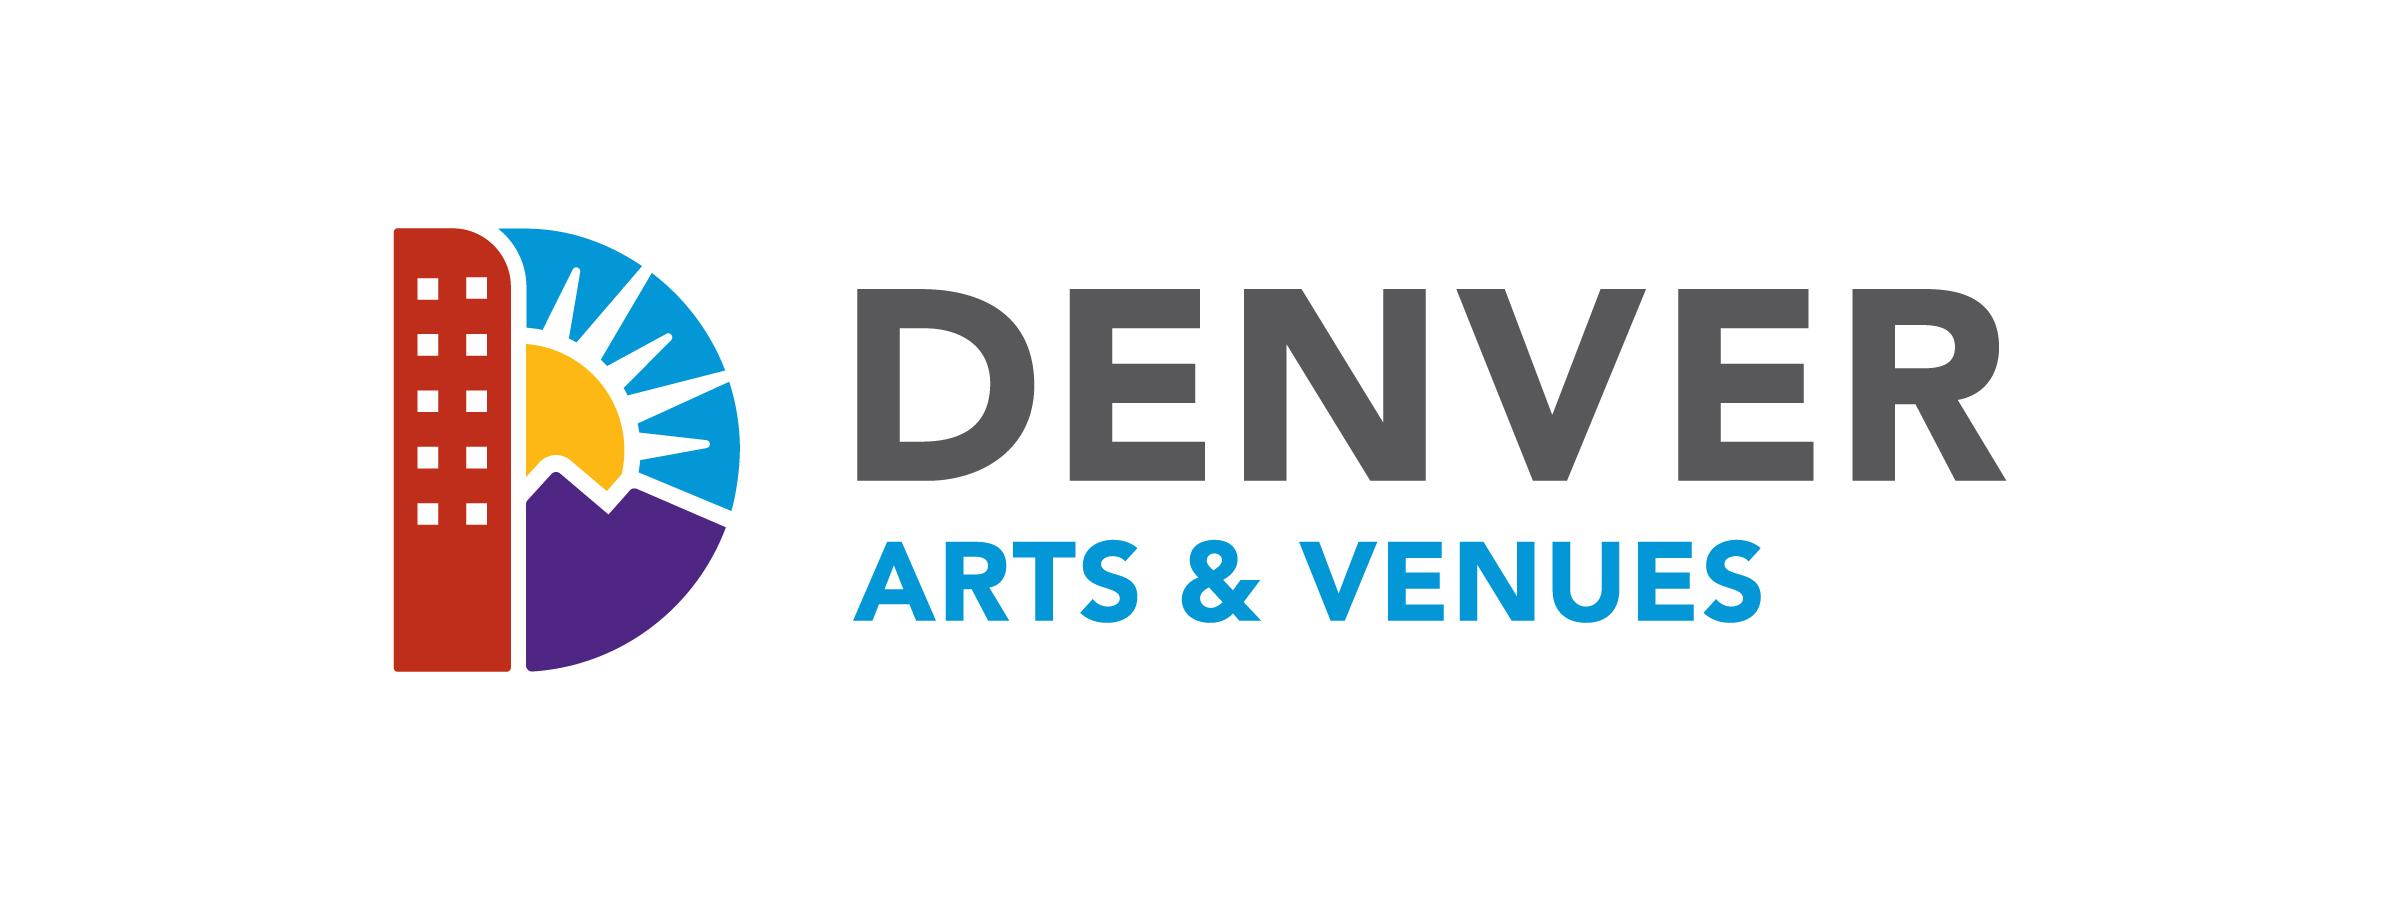 4_DenverArtsAndVenues_RGB-96c330b812.jpg